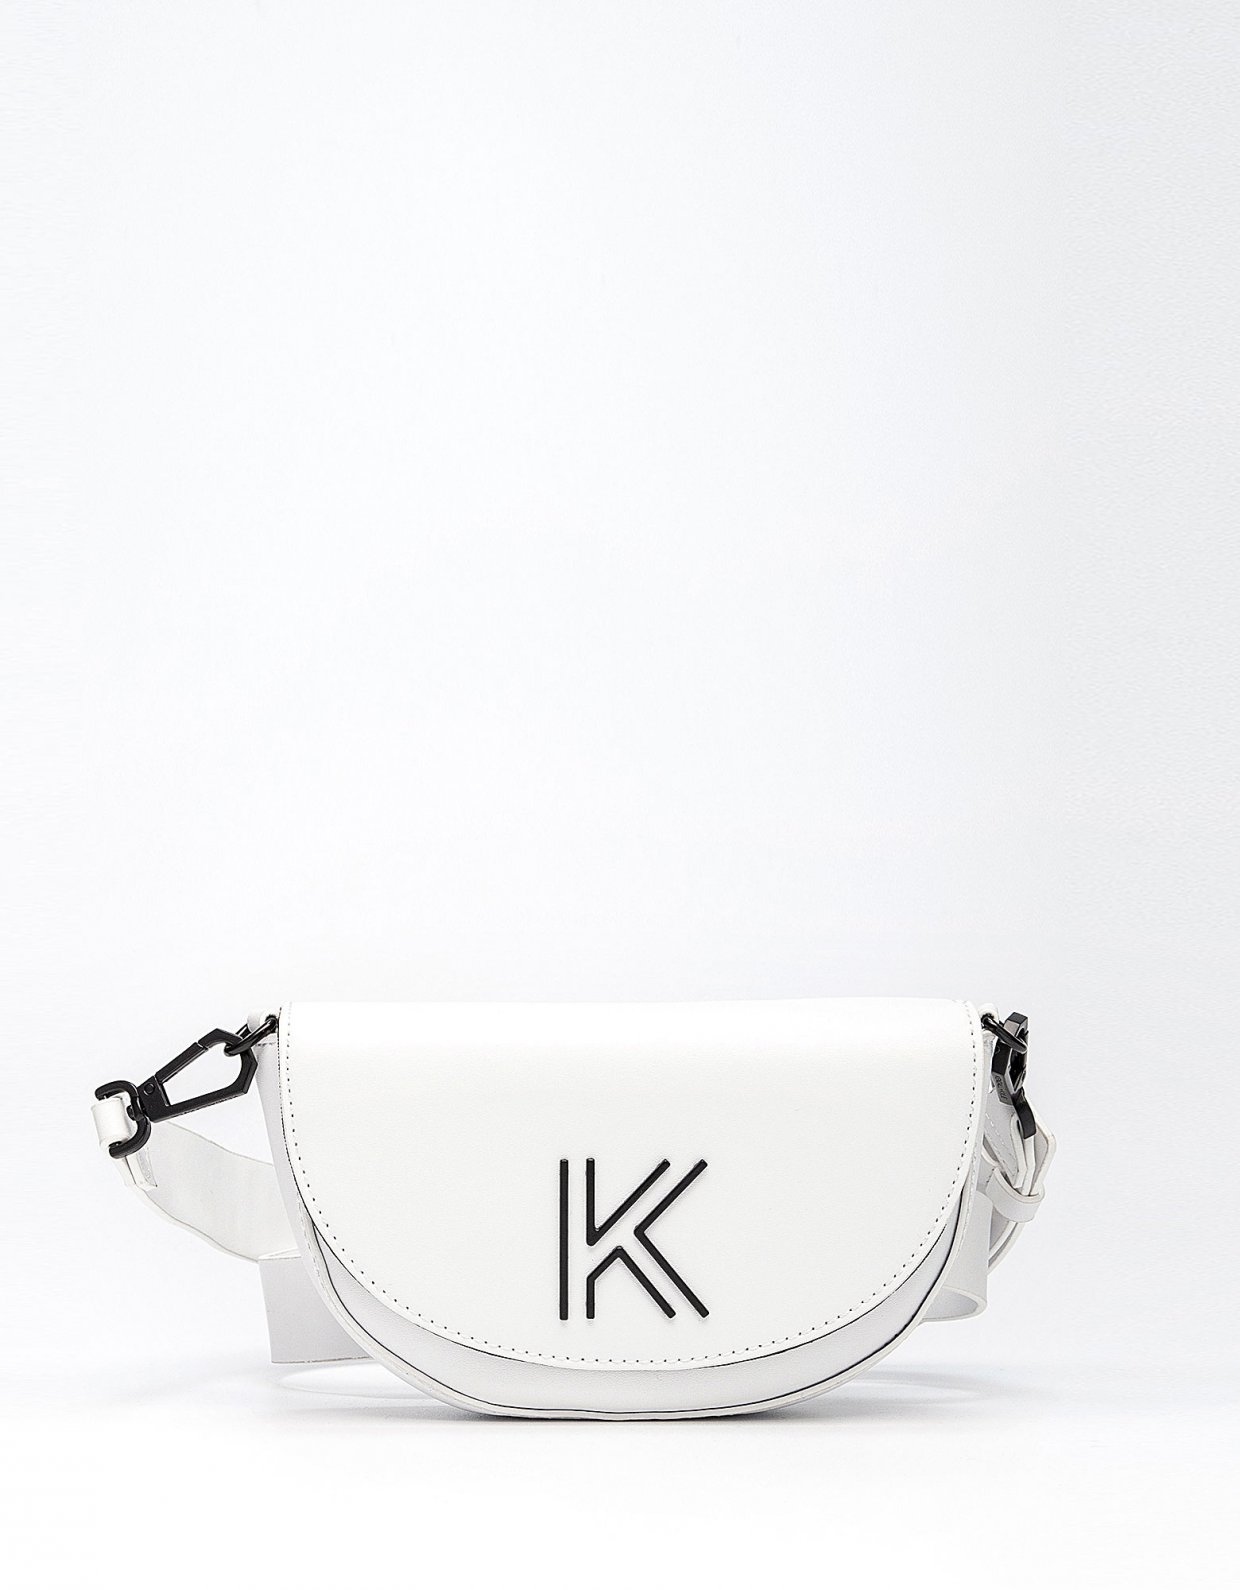 Kendall + Kylie Cynthia waist bag white